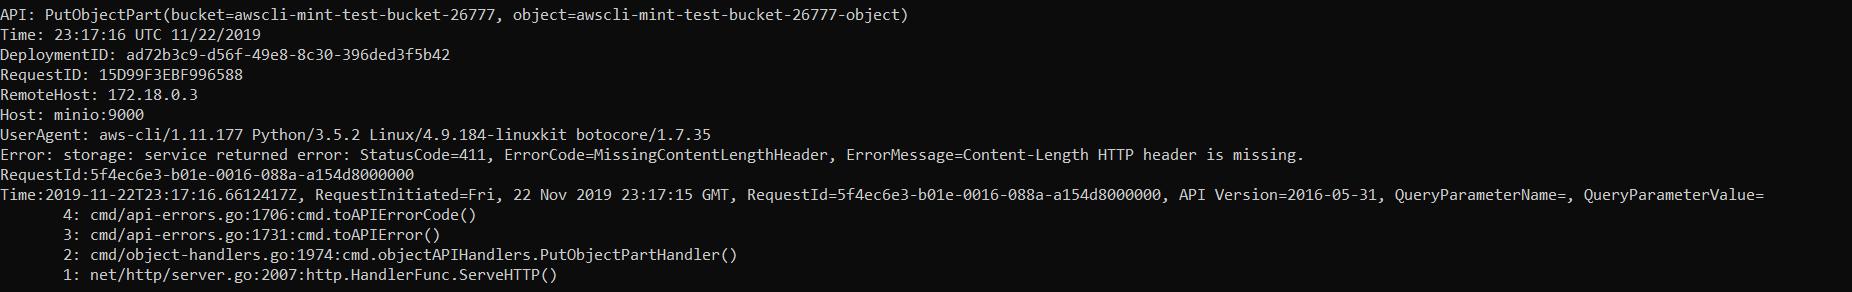 Screenshot showing docker logs for aws-cli test failure